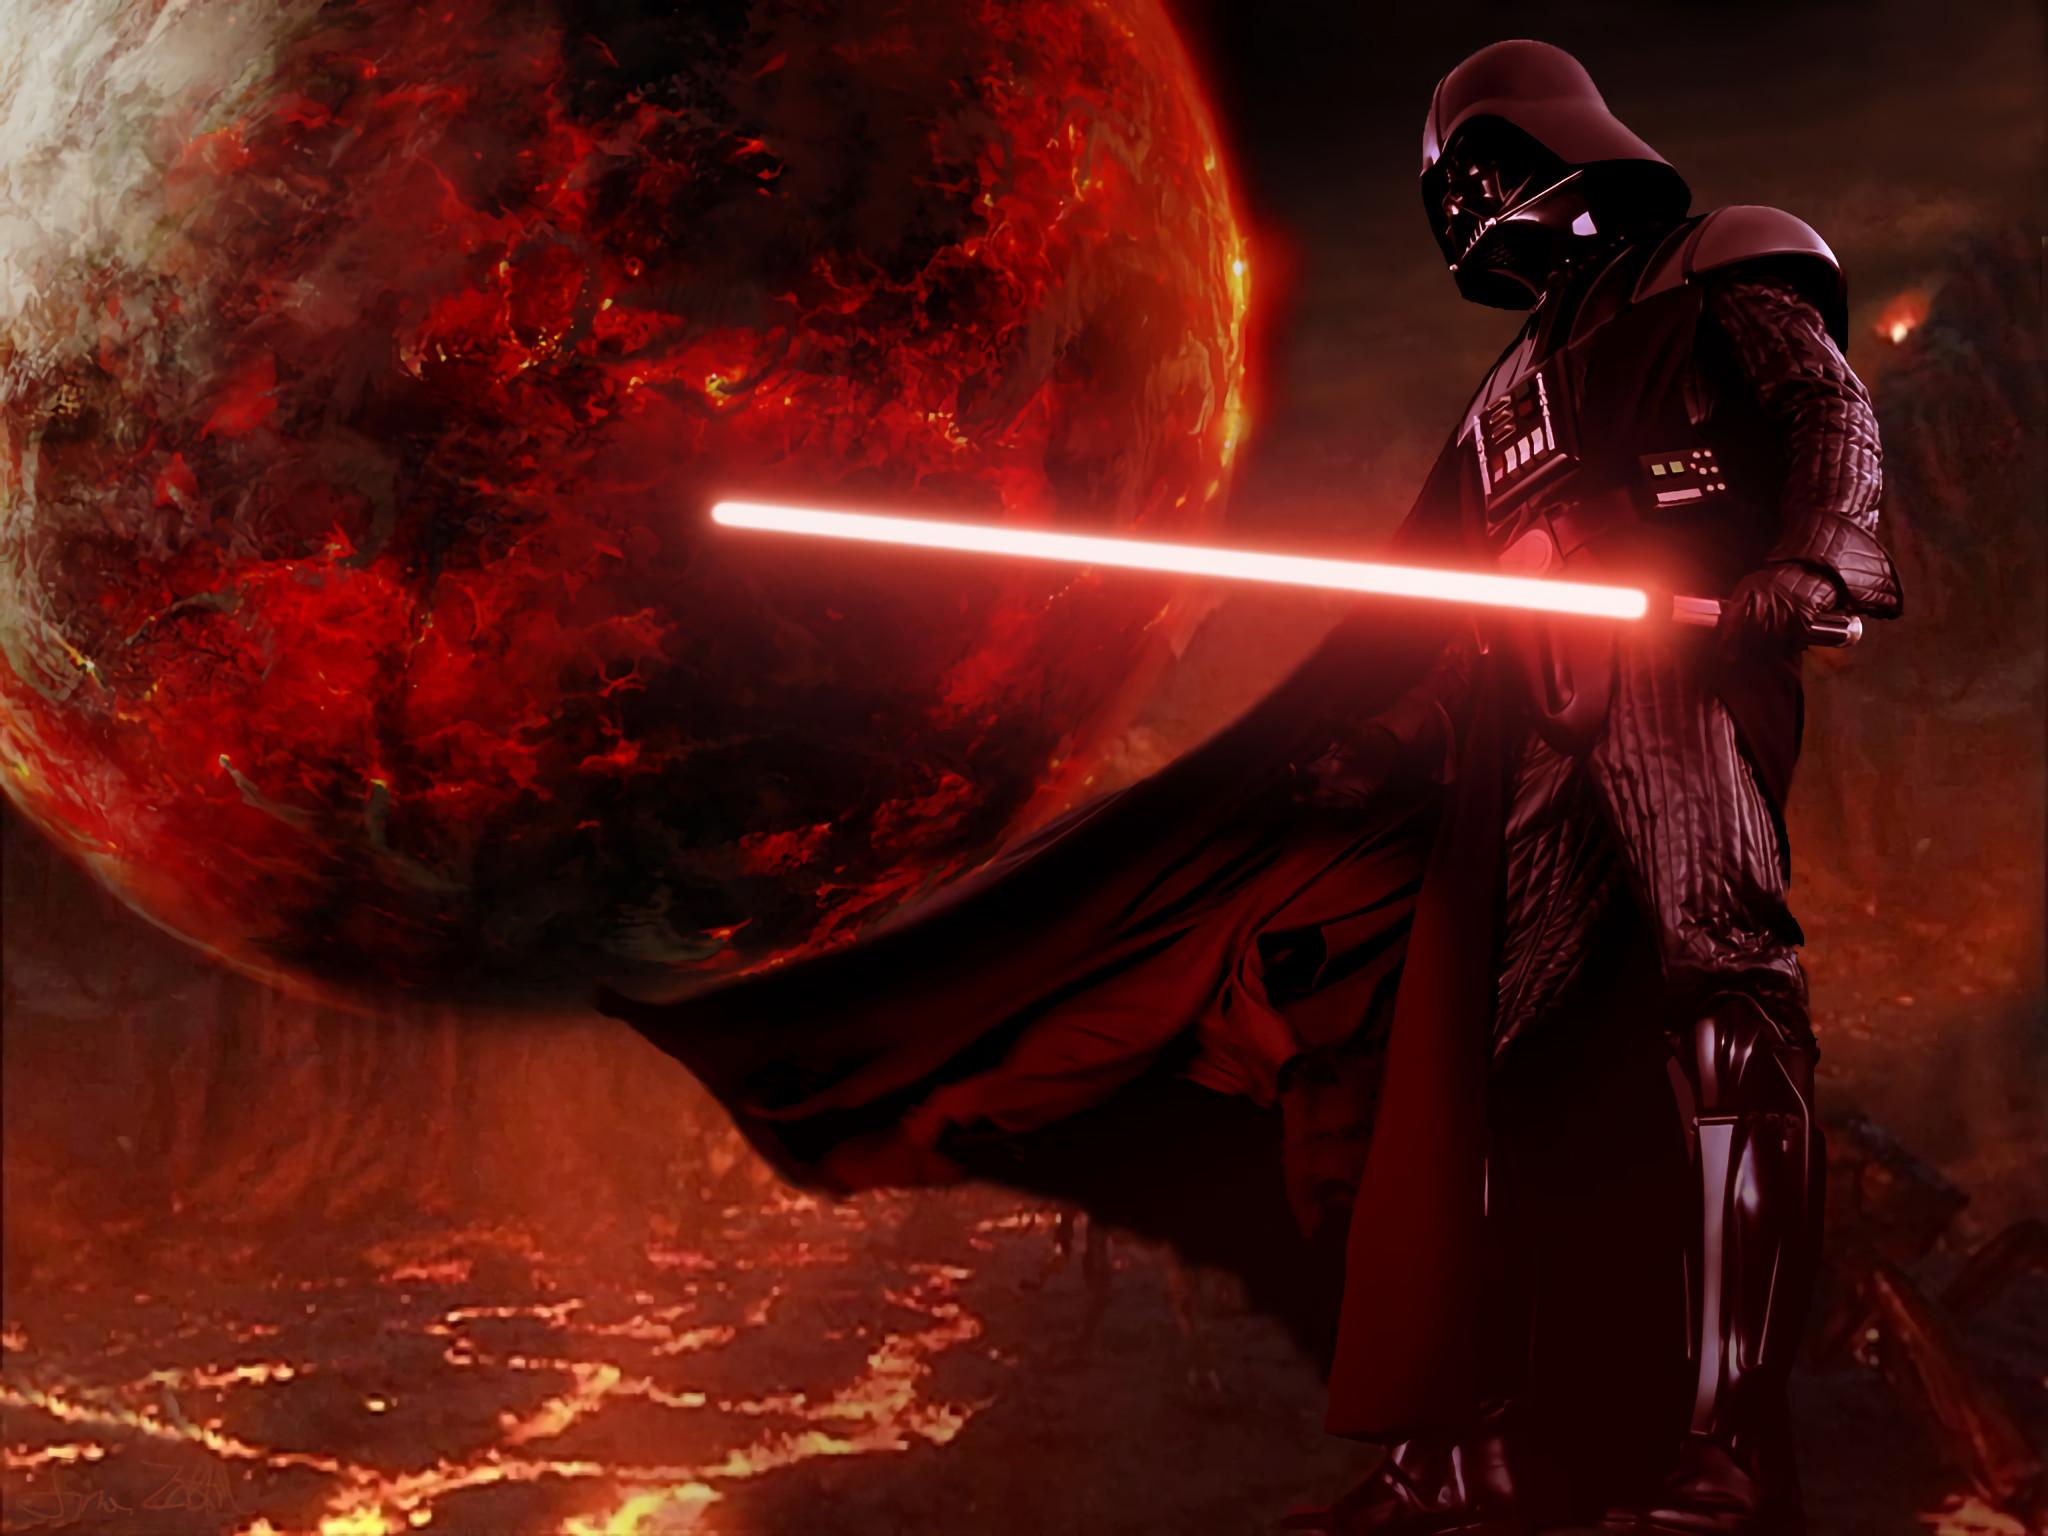 Res: 2048x1536, Star Wars Sith Wallpaper 1080p